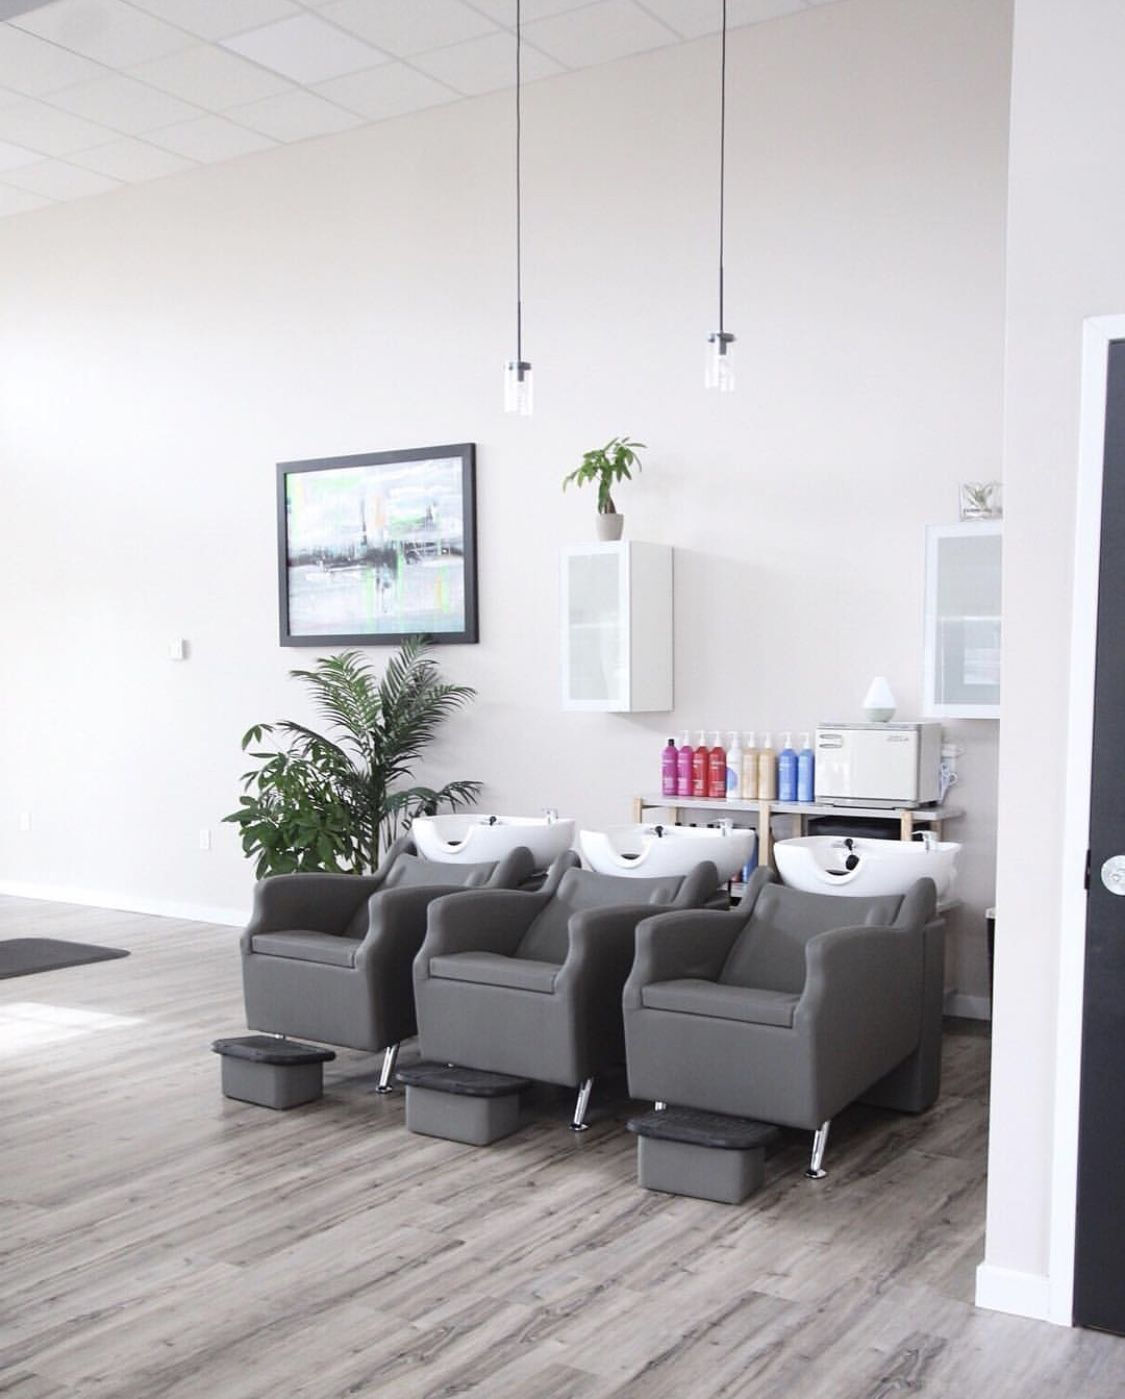 We Love The Clean And Modern Look Of The Shampoo Area At Virtue Hair Studio In Dartmouth Nova Scotia Salon Suites Decor Hair Salon Interior Beauty Room Salon